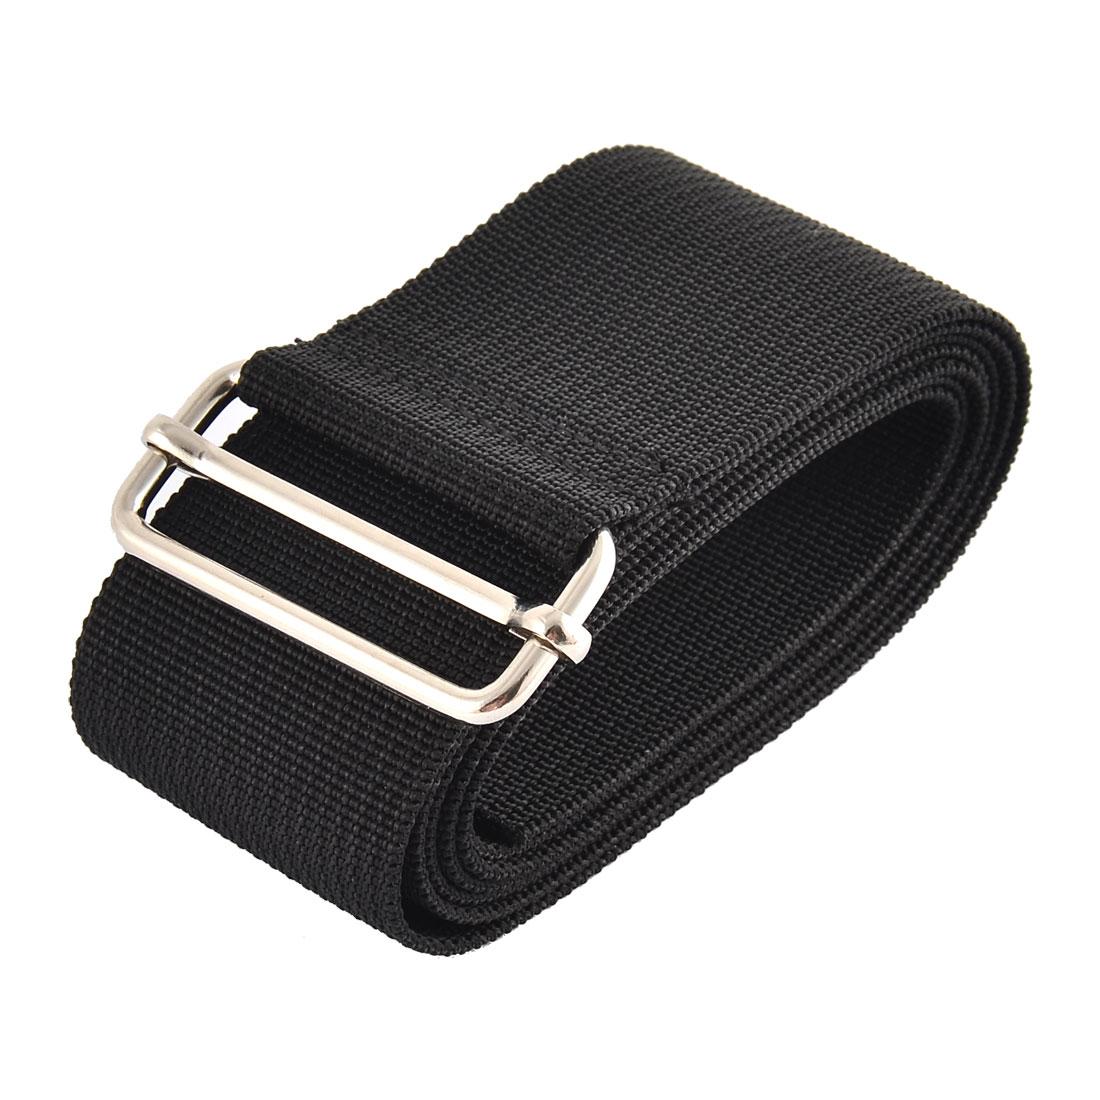 Home Travel Nylon Adjustable Suitcase Luggage Strap Belt Loop Black 1.5M Length